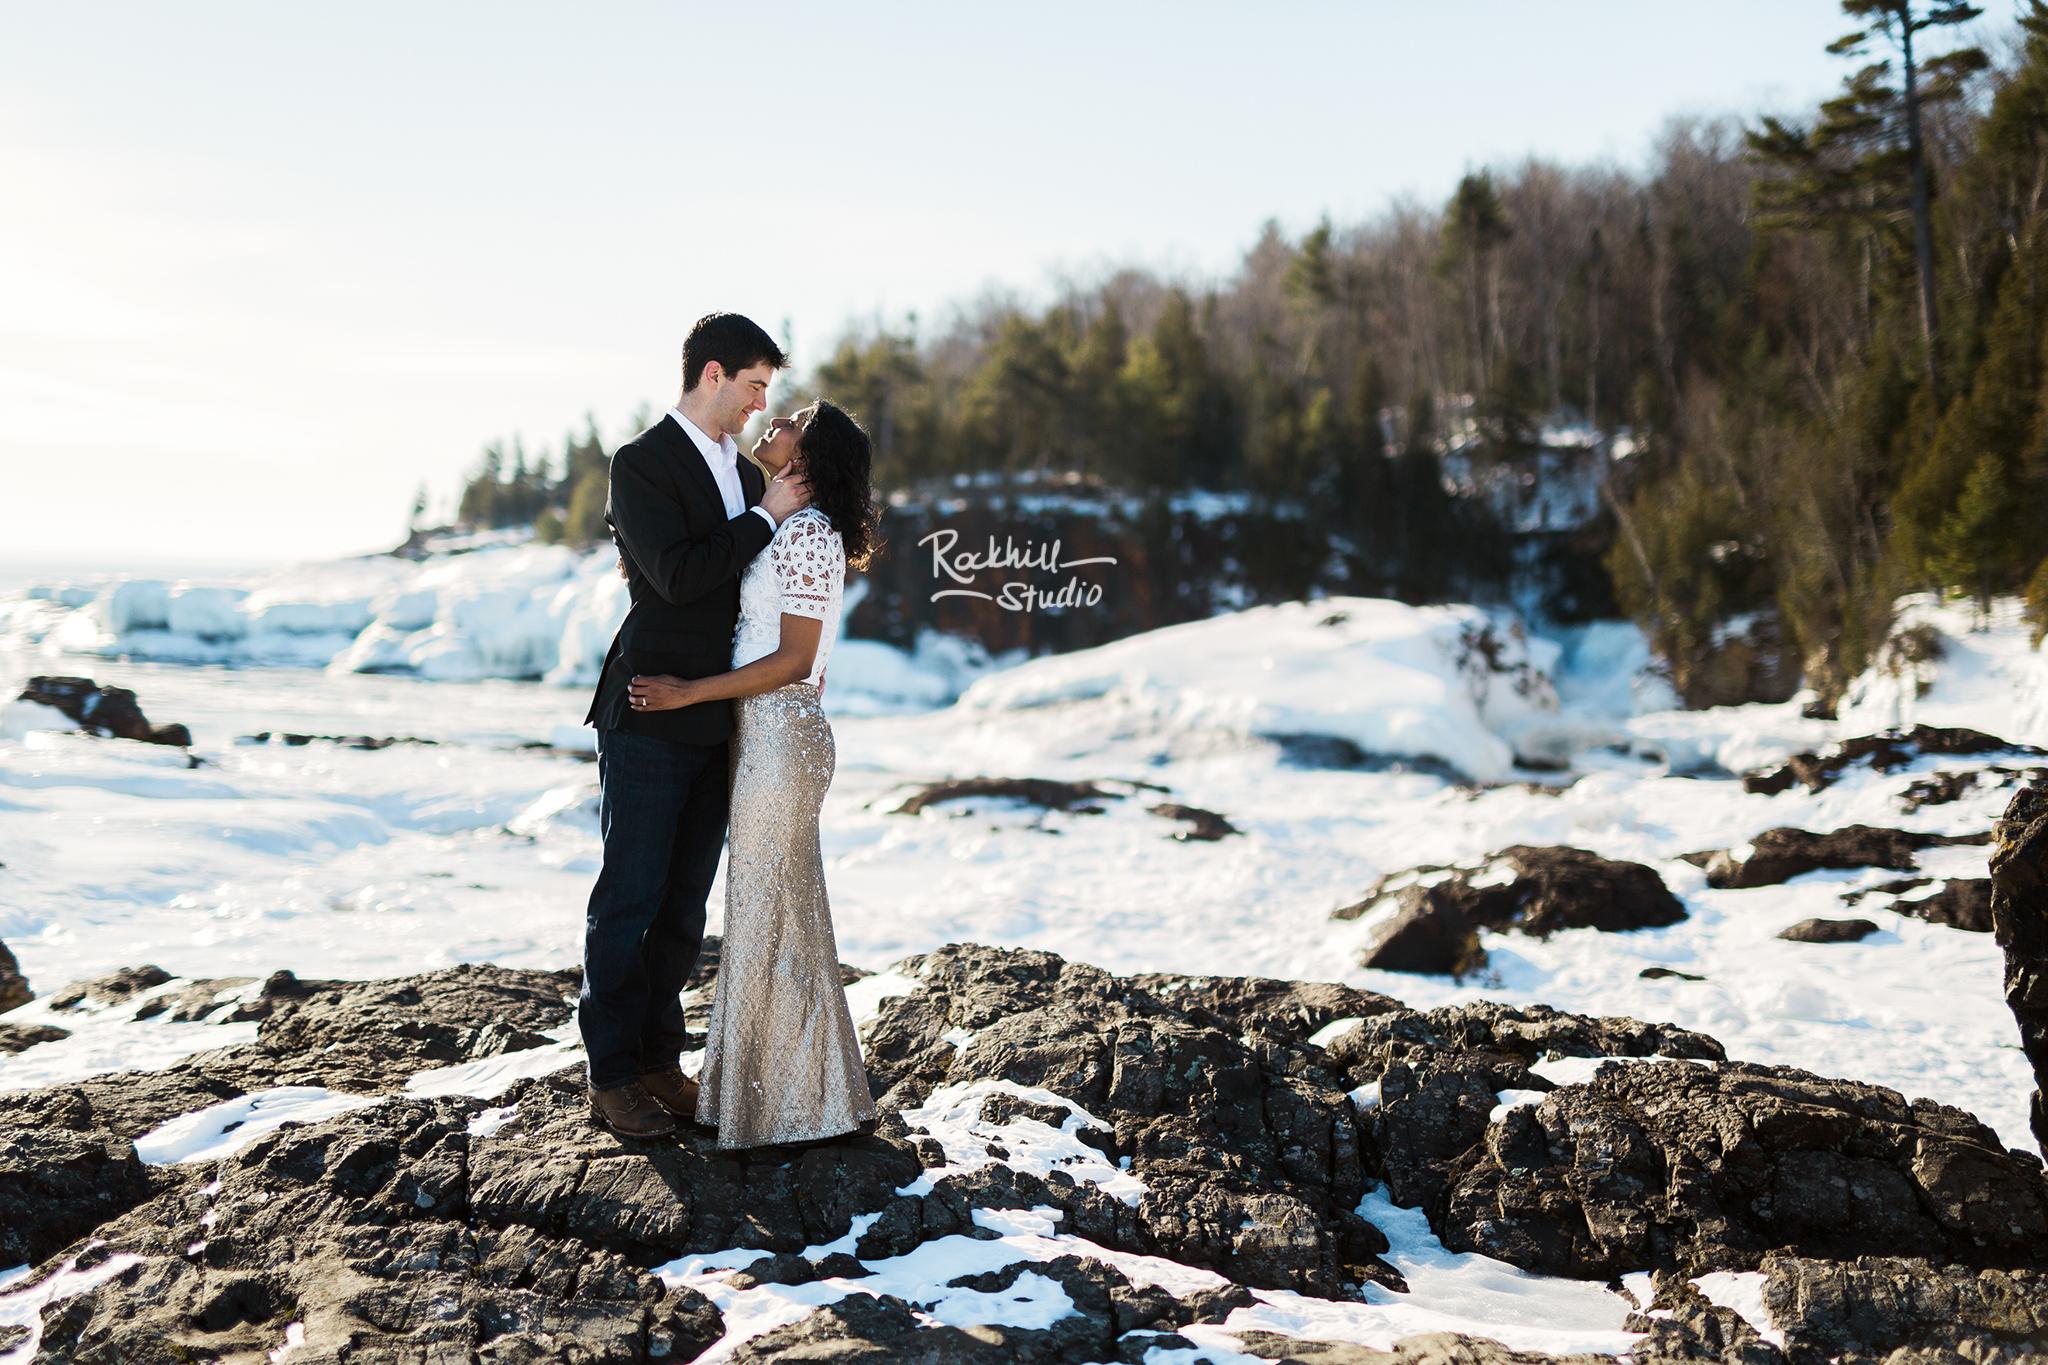 Marquette-engagemet-photography-wedding-northern-michigan-lake-superior-presque-isle-1.jpg